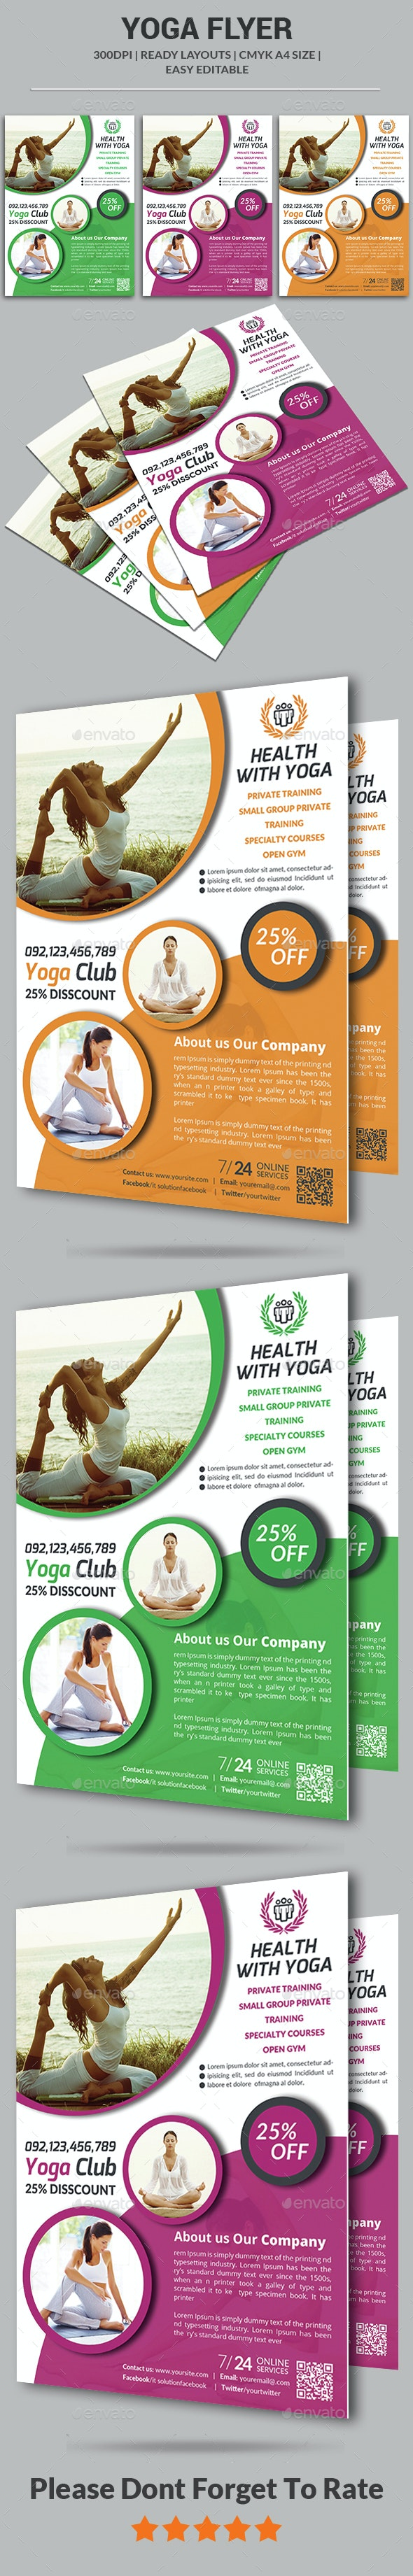 Yoga Flyer  - Corporate Flyers